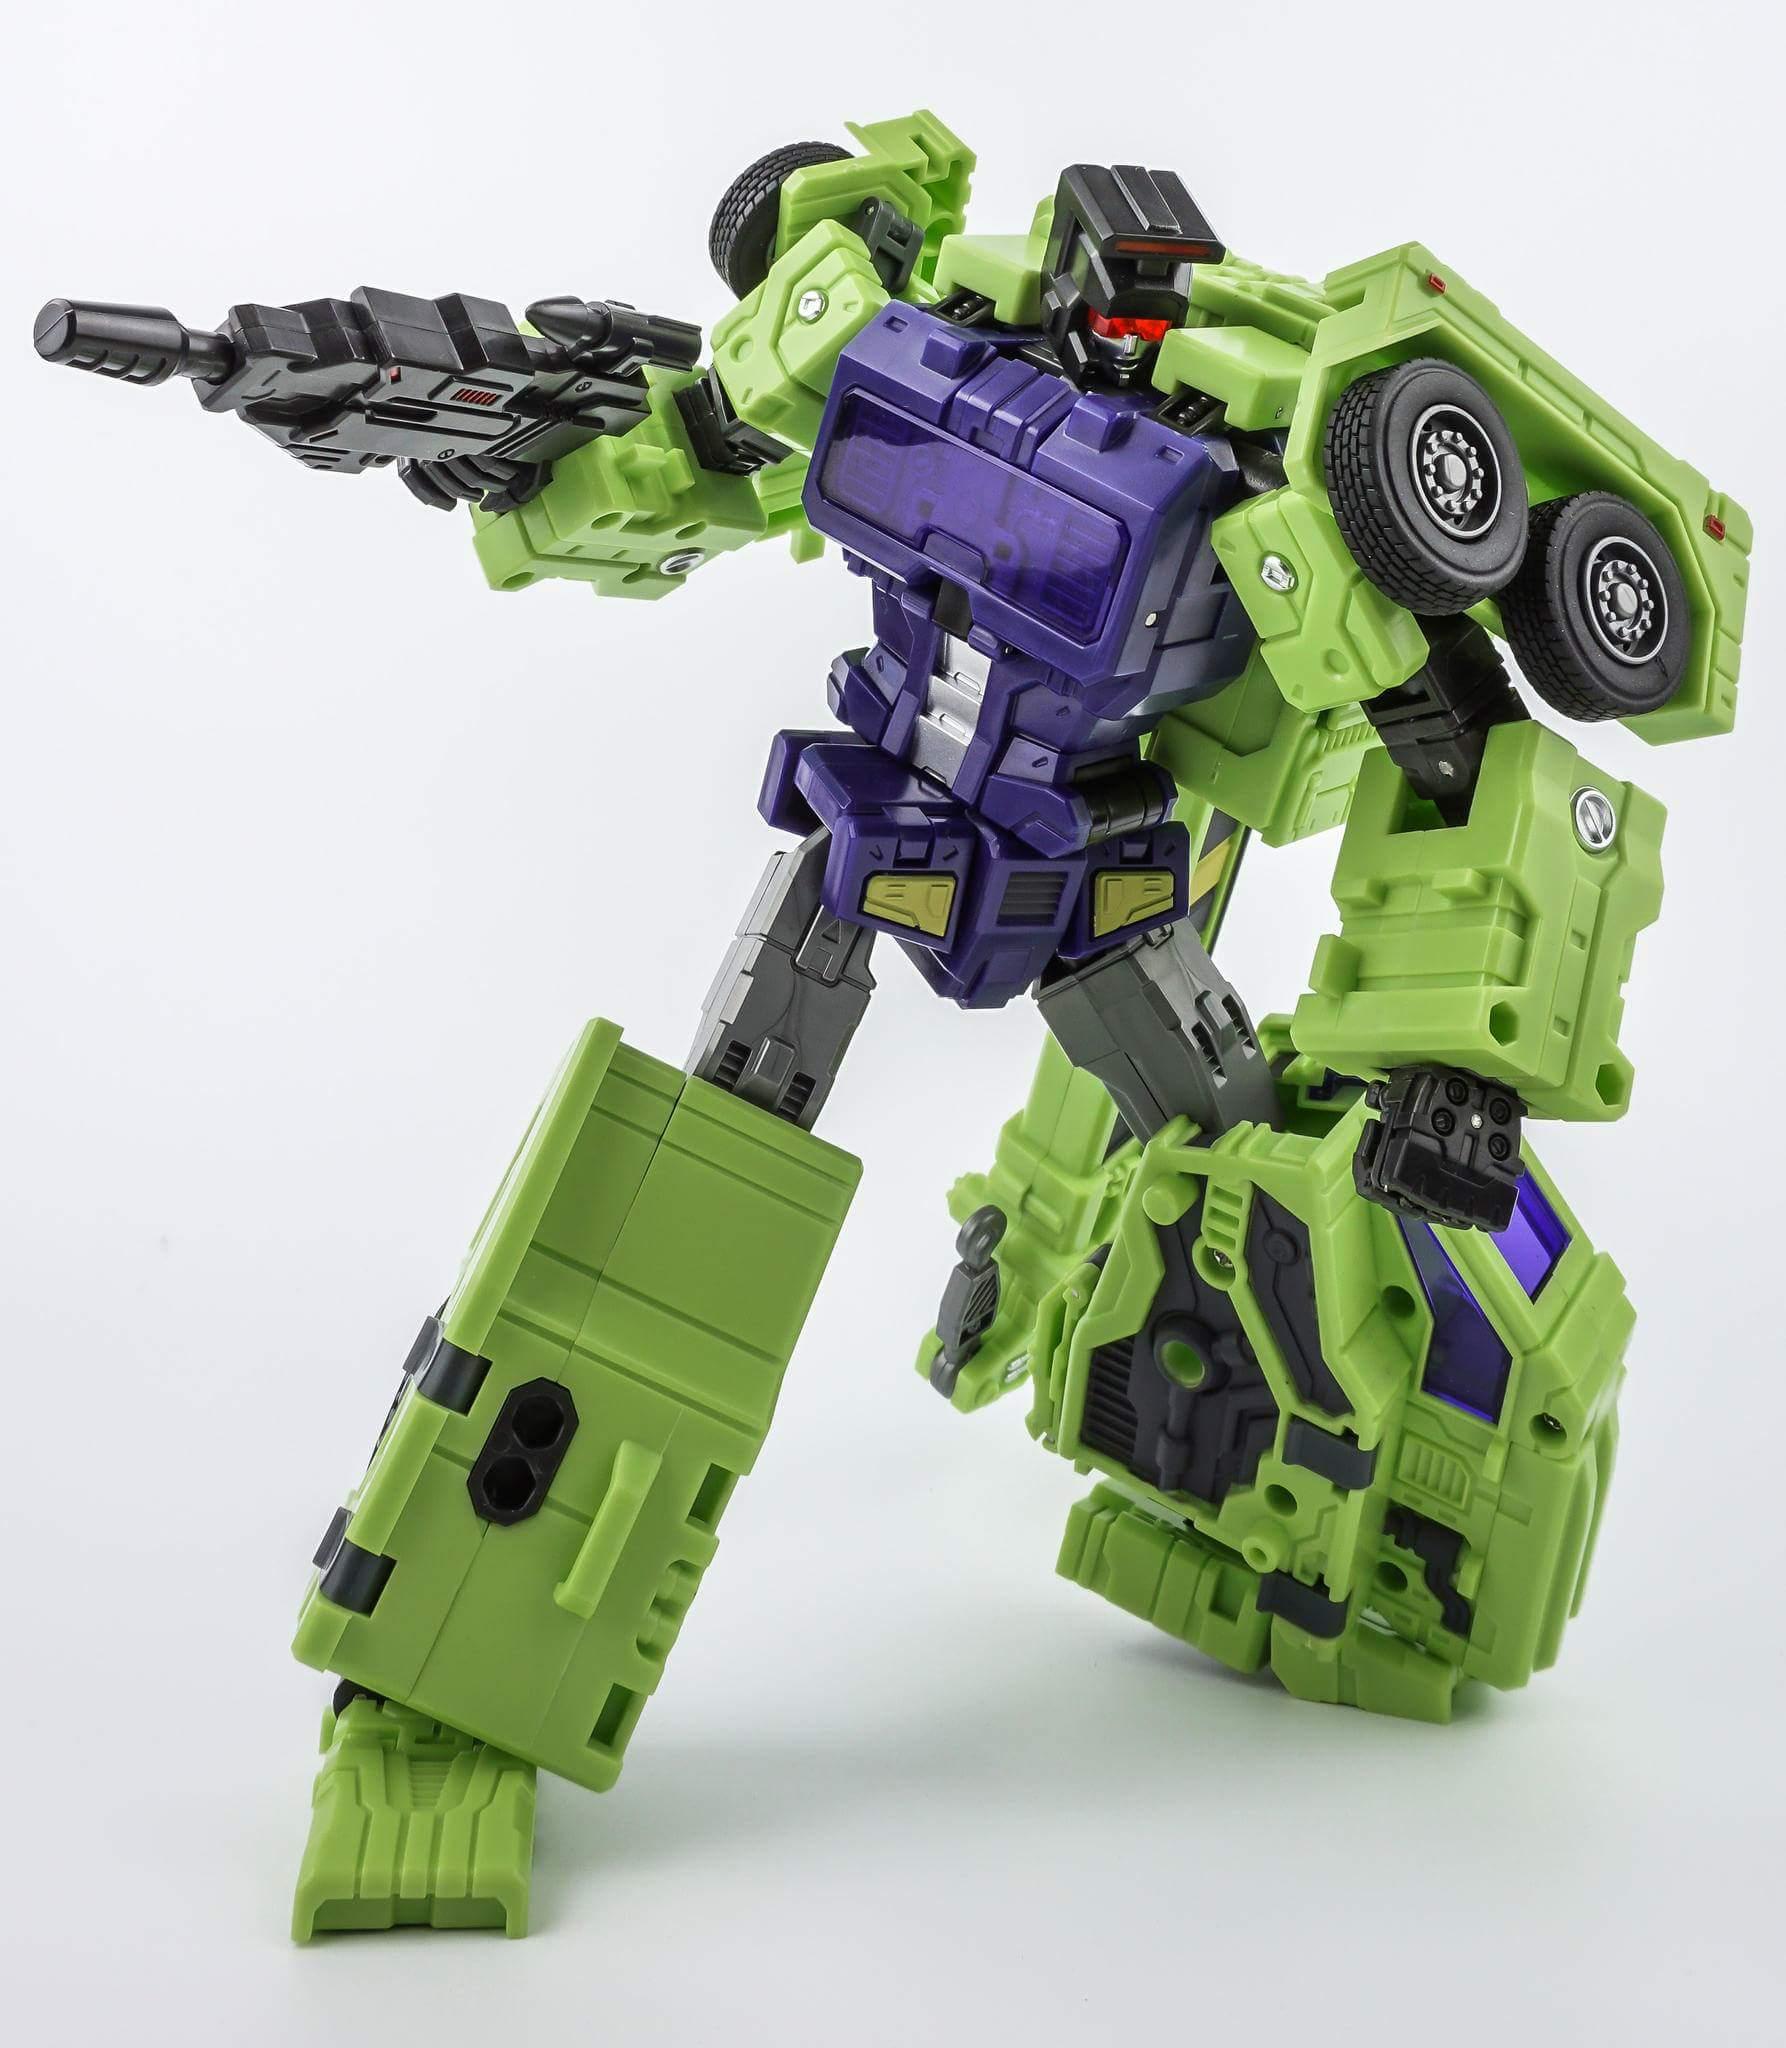 [Toyworld] Produit Tiers - Jouet TW-C Constructor aka Devastator/Dévastateur (Version vert G1 et jaune G2) - Page 6 U5gLu5nY